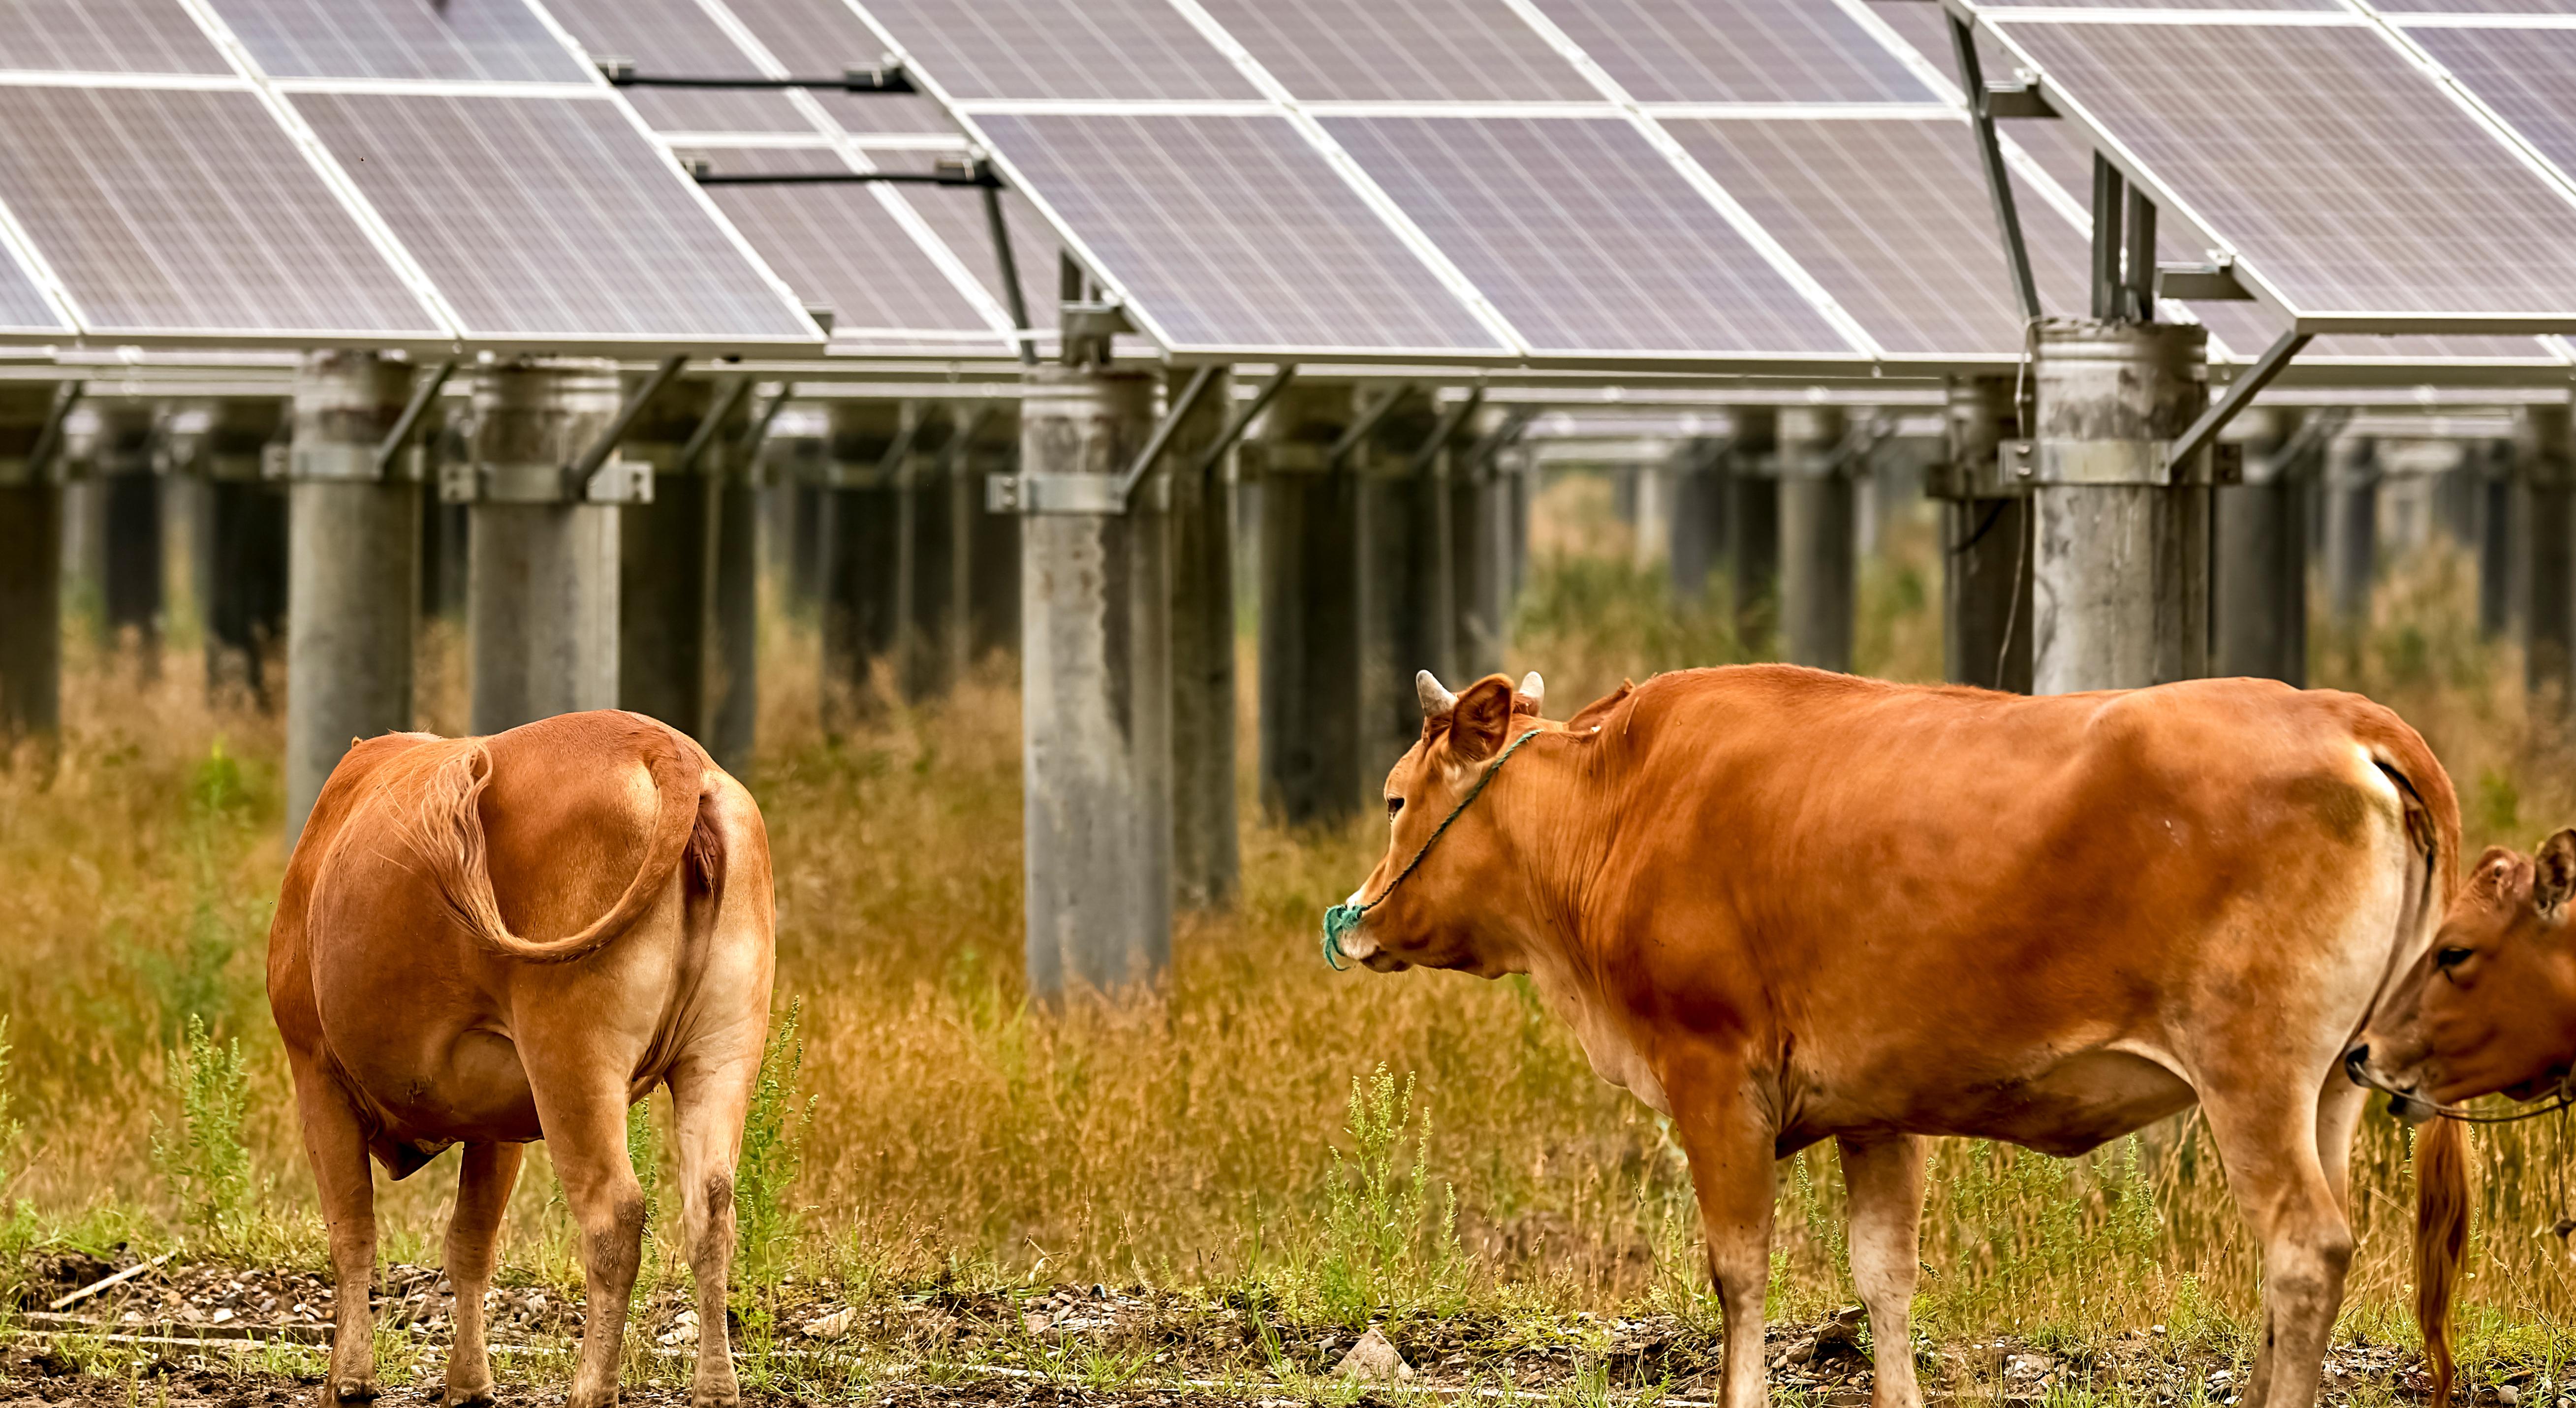 Cows near solar panels